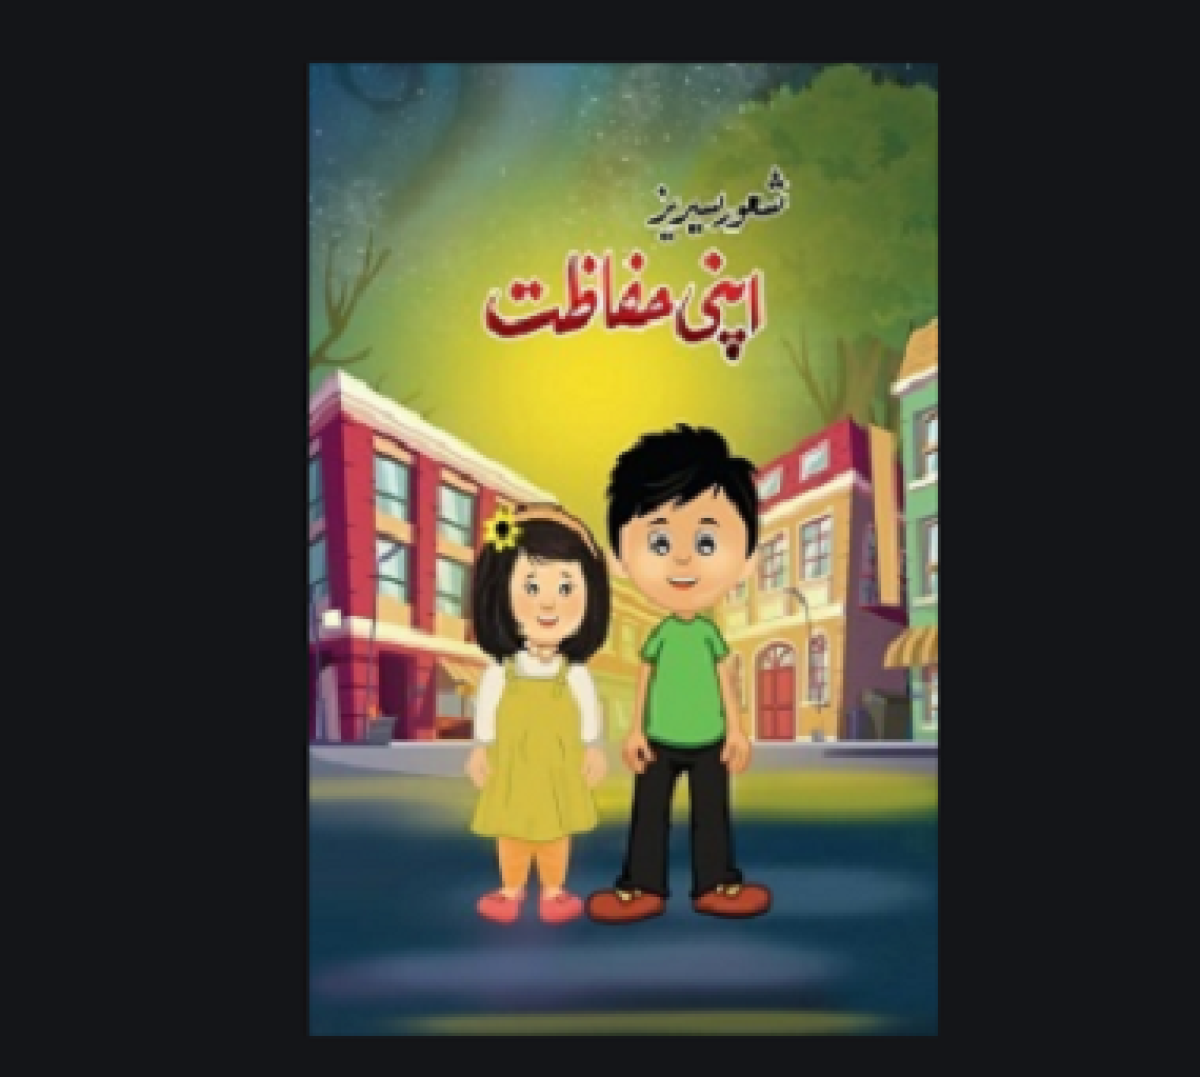 Apni Hifazat urdu novel By Umaira Ahmed best selling urdu reading book